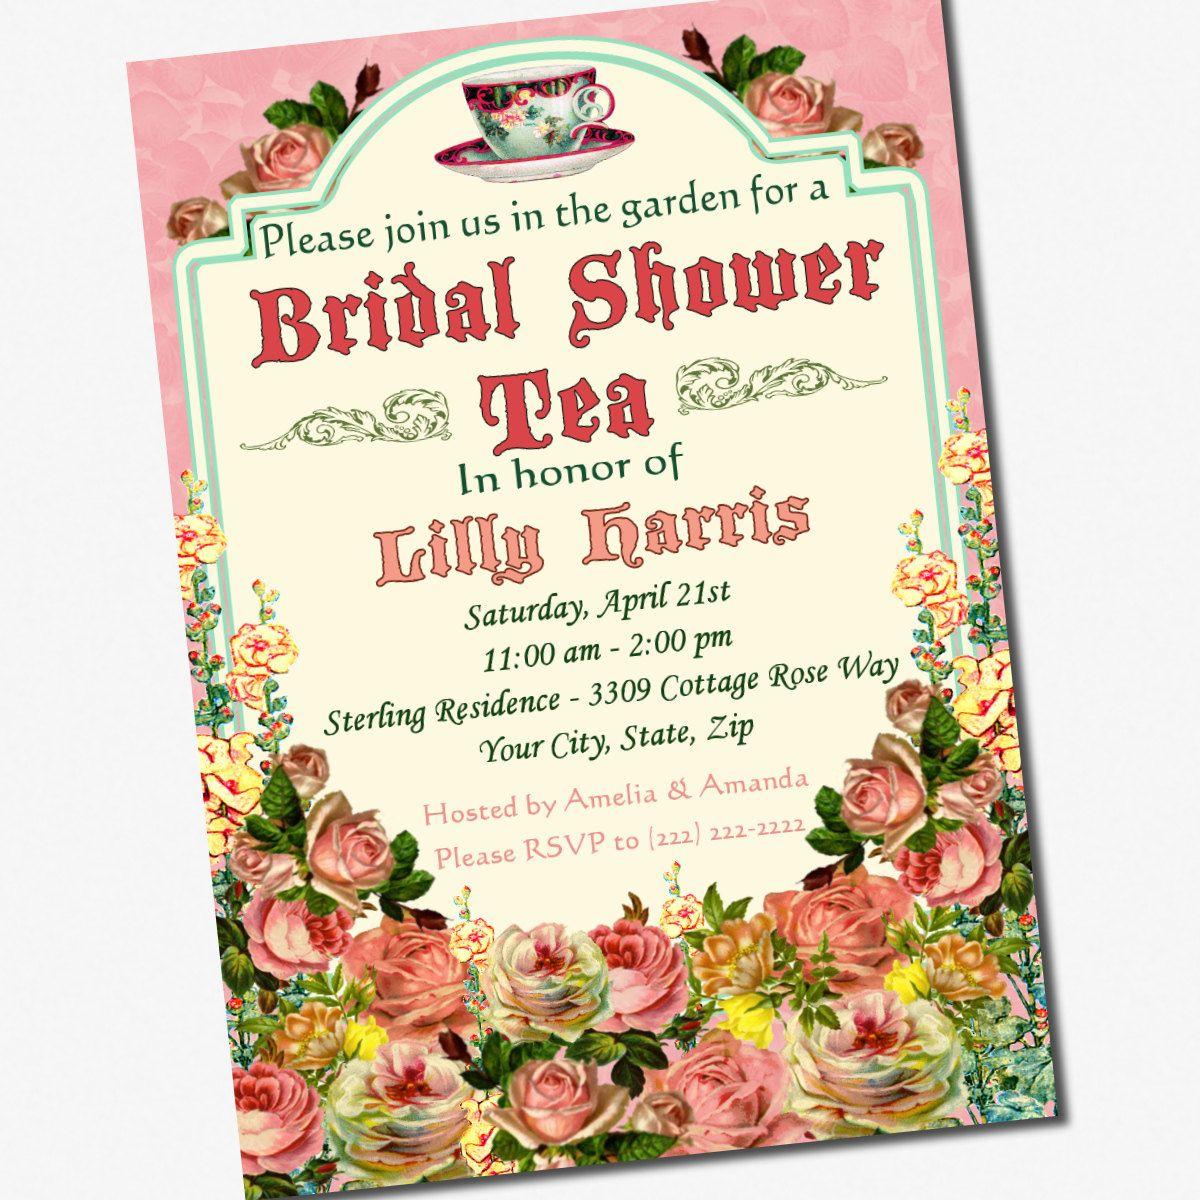 17 Best images about Vintage Tea Party Bridal Shower on Pinterest ...